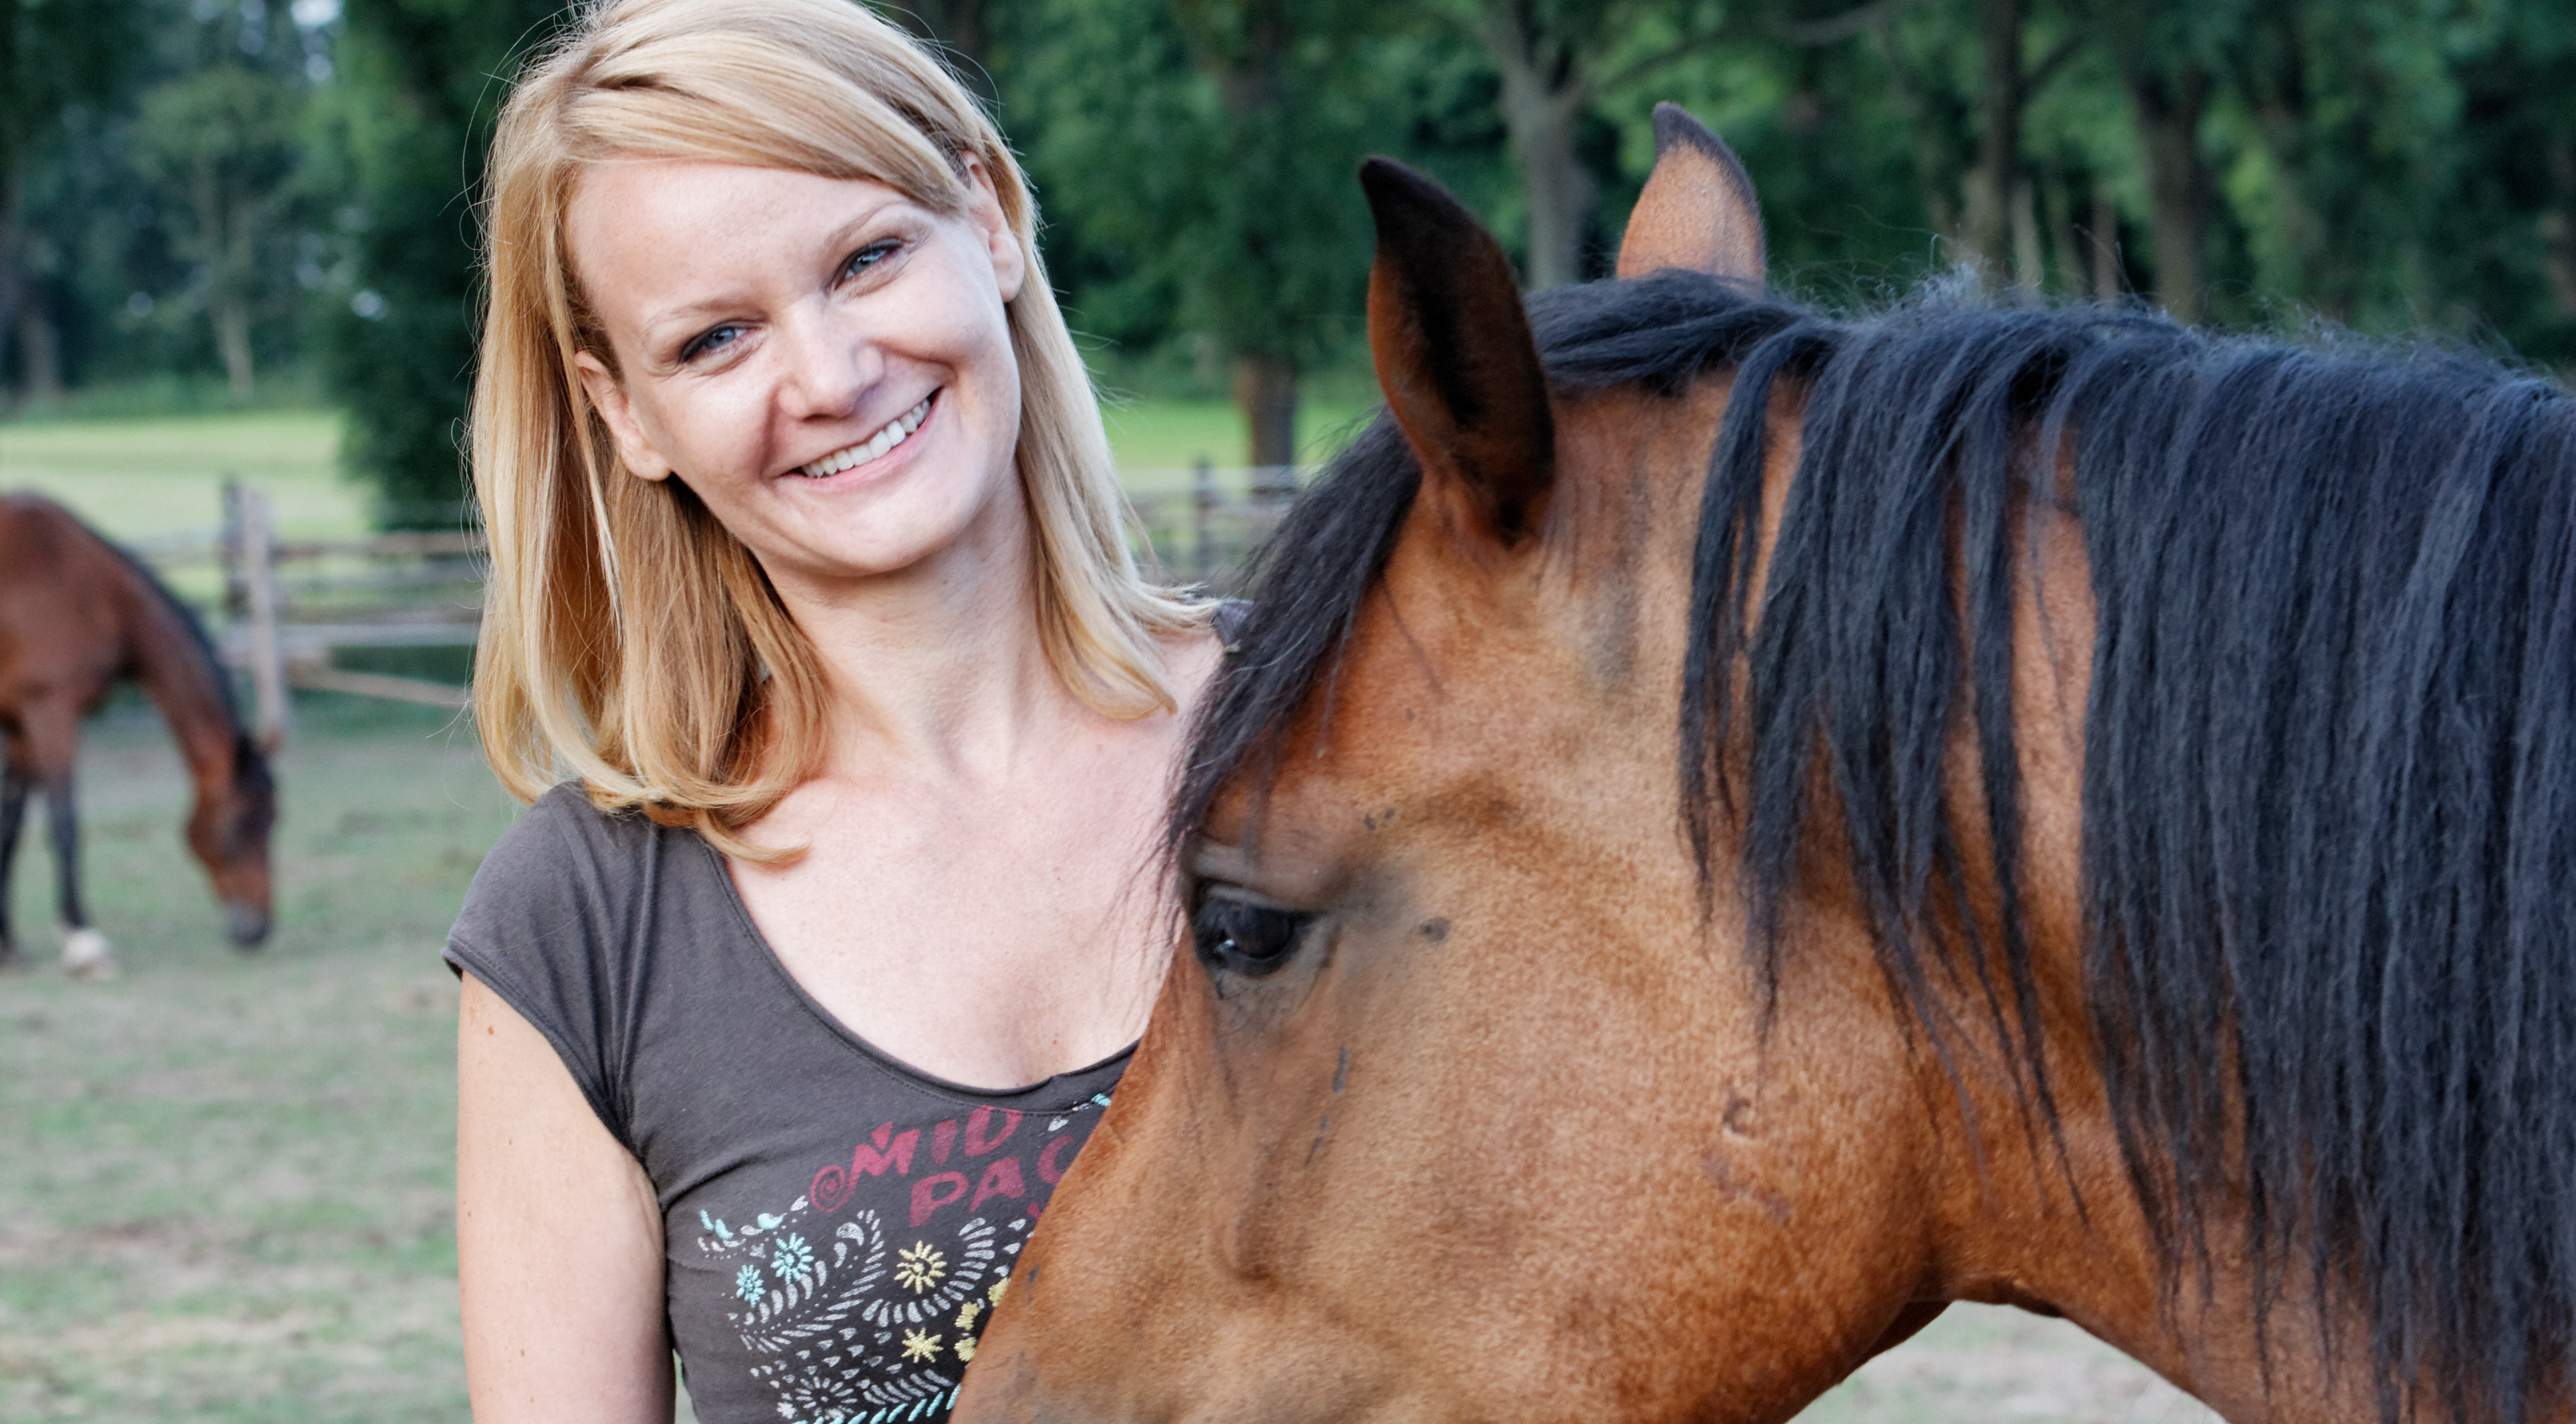 tierkommunikation-berlin-bundesweit-tiere-verstehen-hundeflüsterer-tierkommunikatorin-claudia-serdynski-mit-pferd.jpg